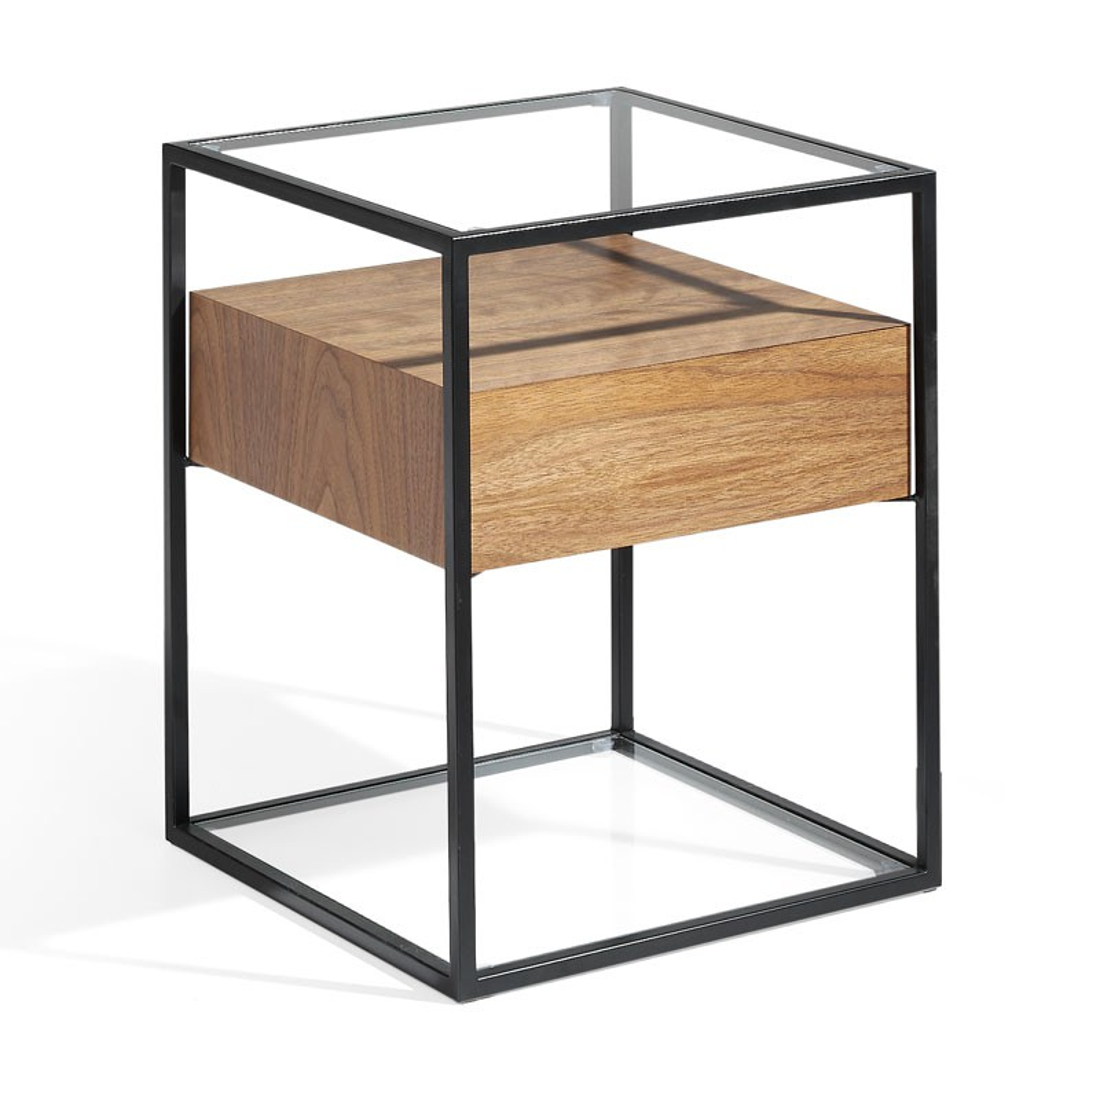 Table d 39 appoint 1 tiroir m tal verre noyer liver petits meubles - Table d appoint malm ...